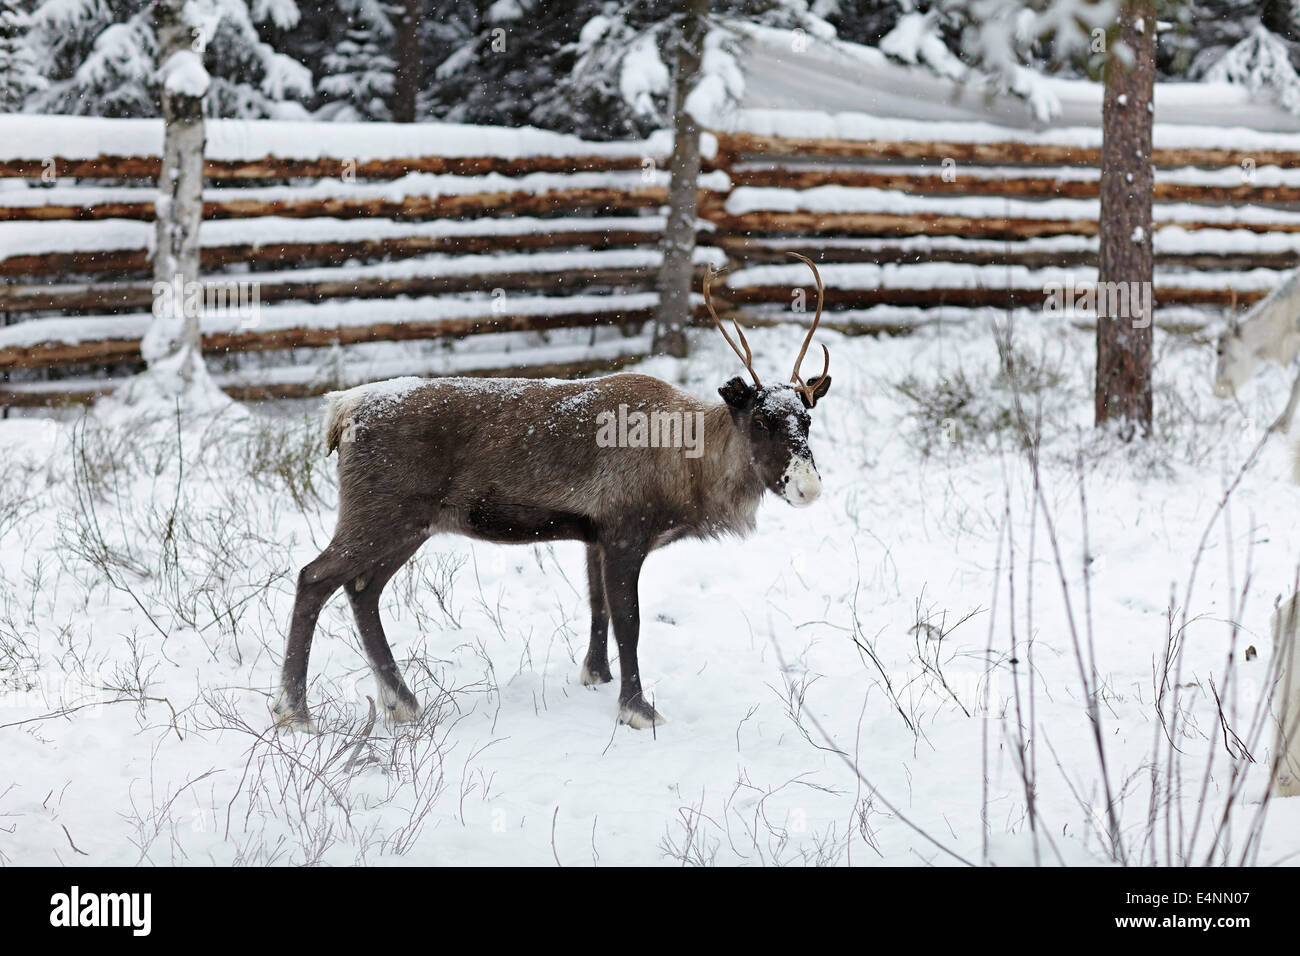 UMEA, northern Sweden. reindeer of the sami indigenous people. - Stock Image